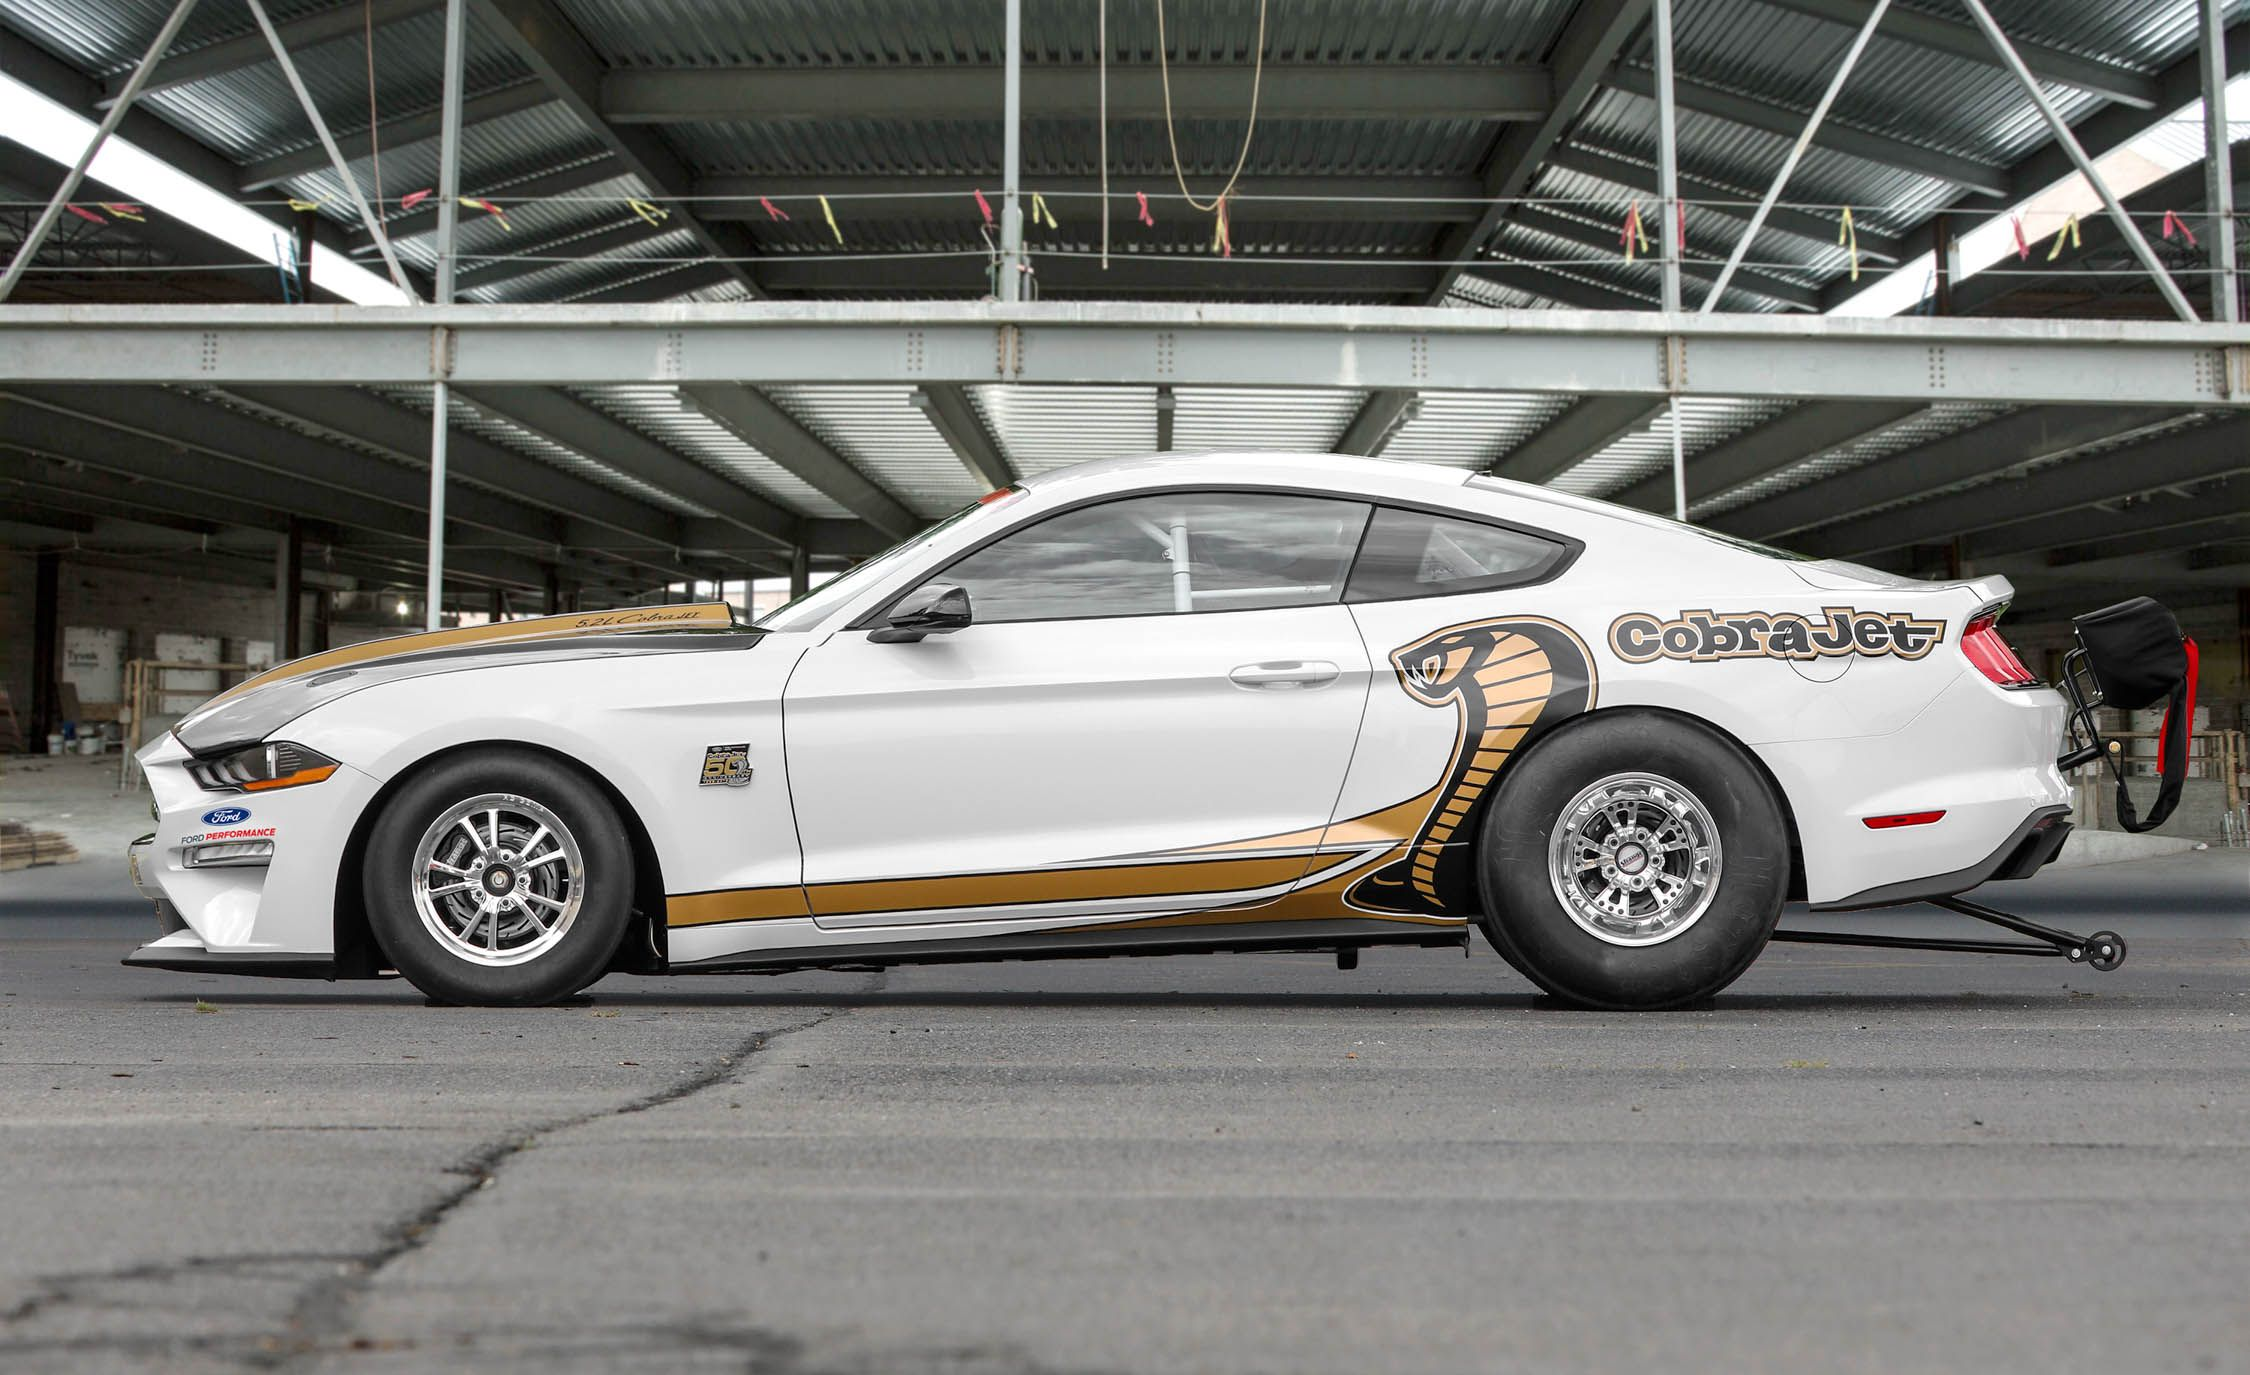 2018 ford mustang cobra jet debuts